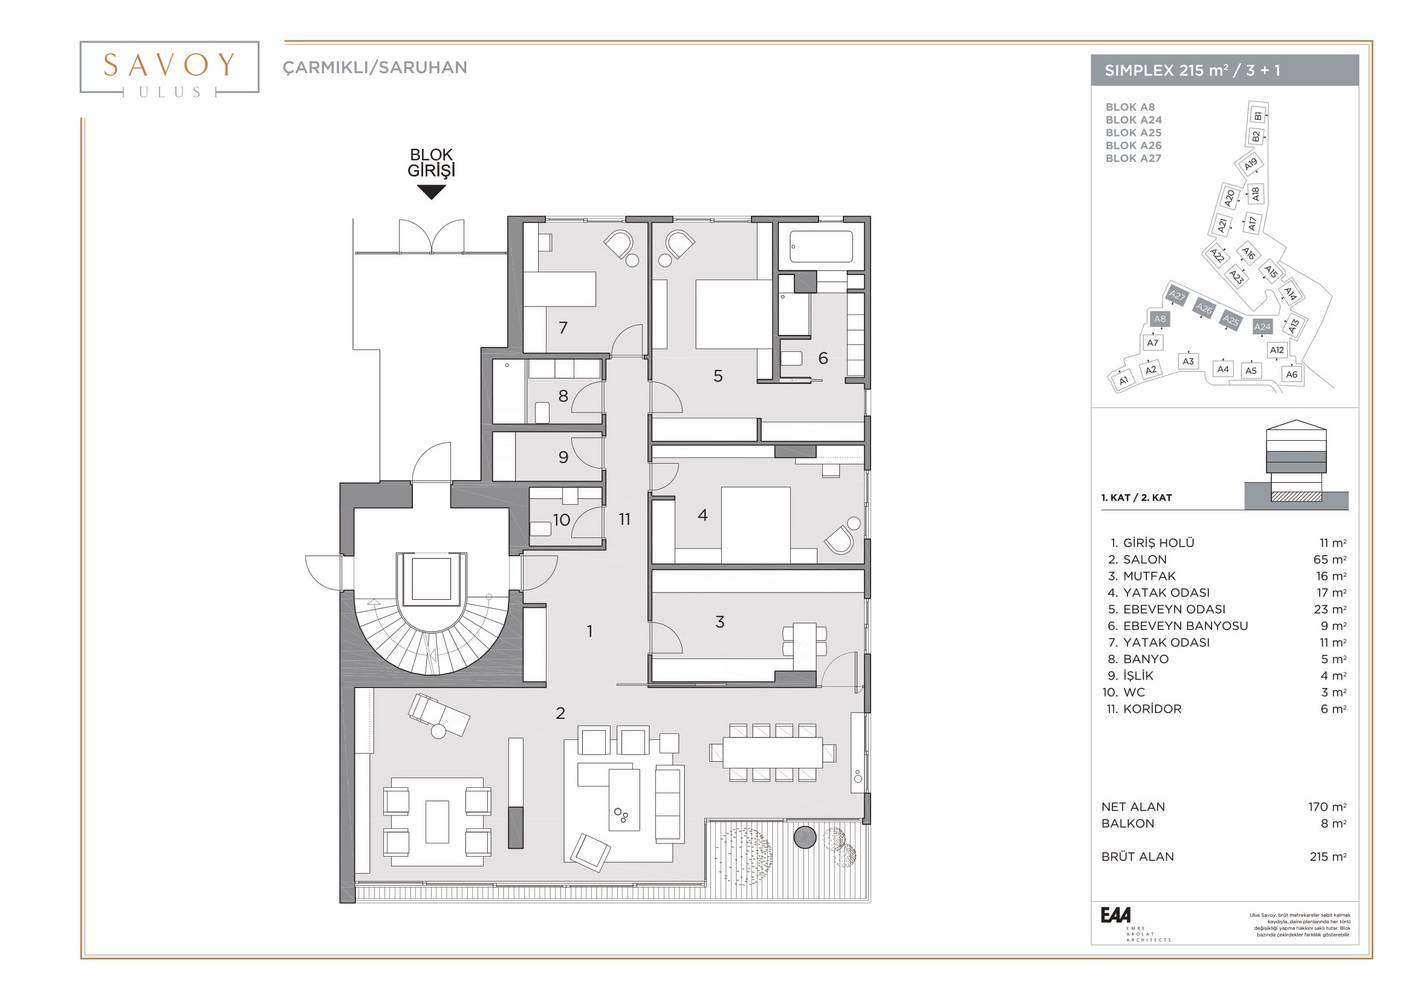 Savoy Residence S215